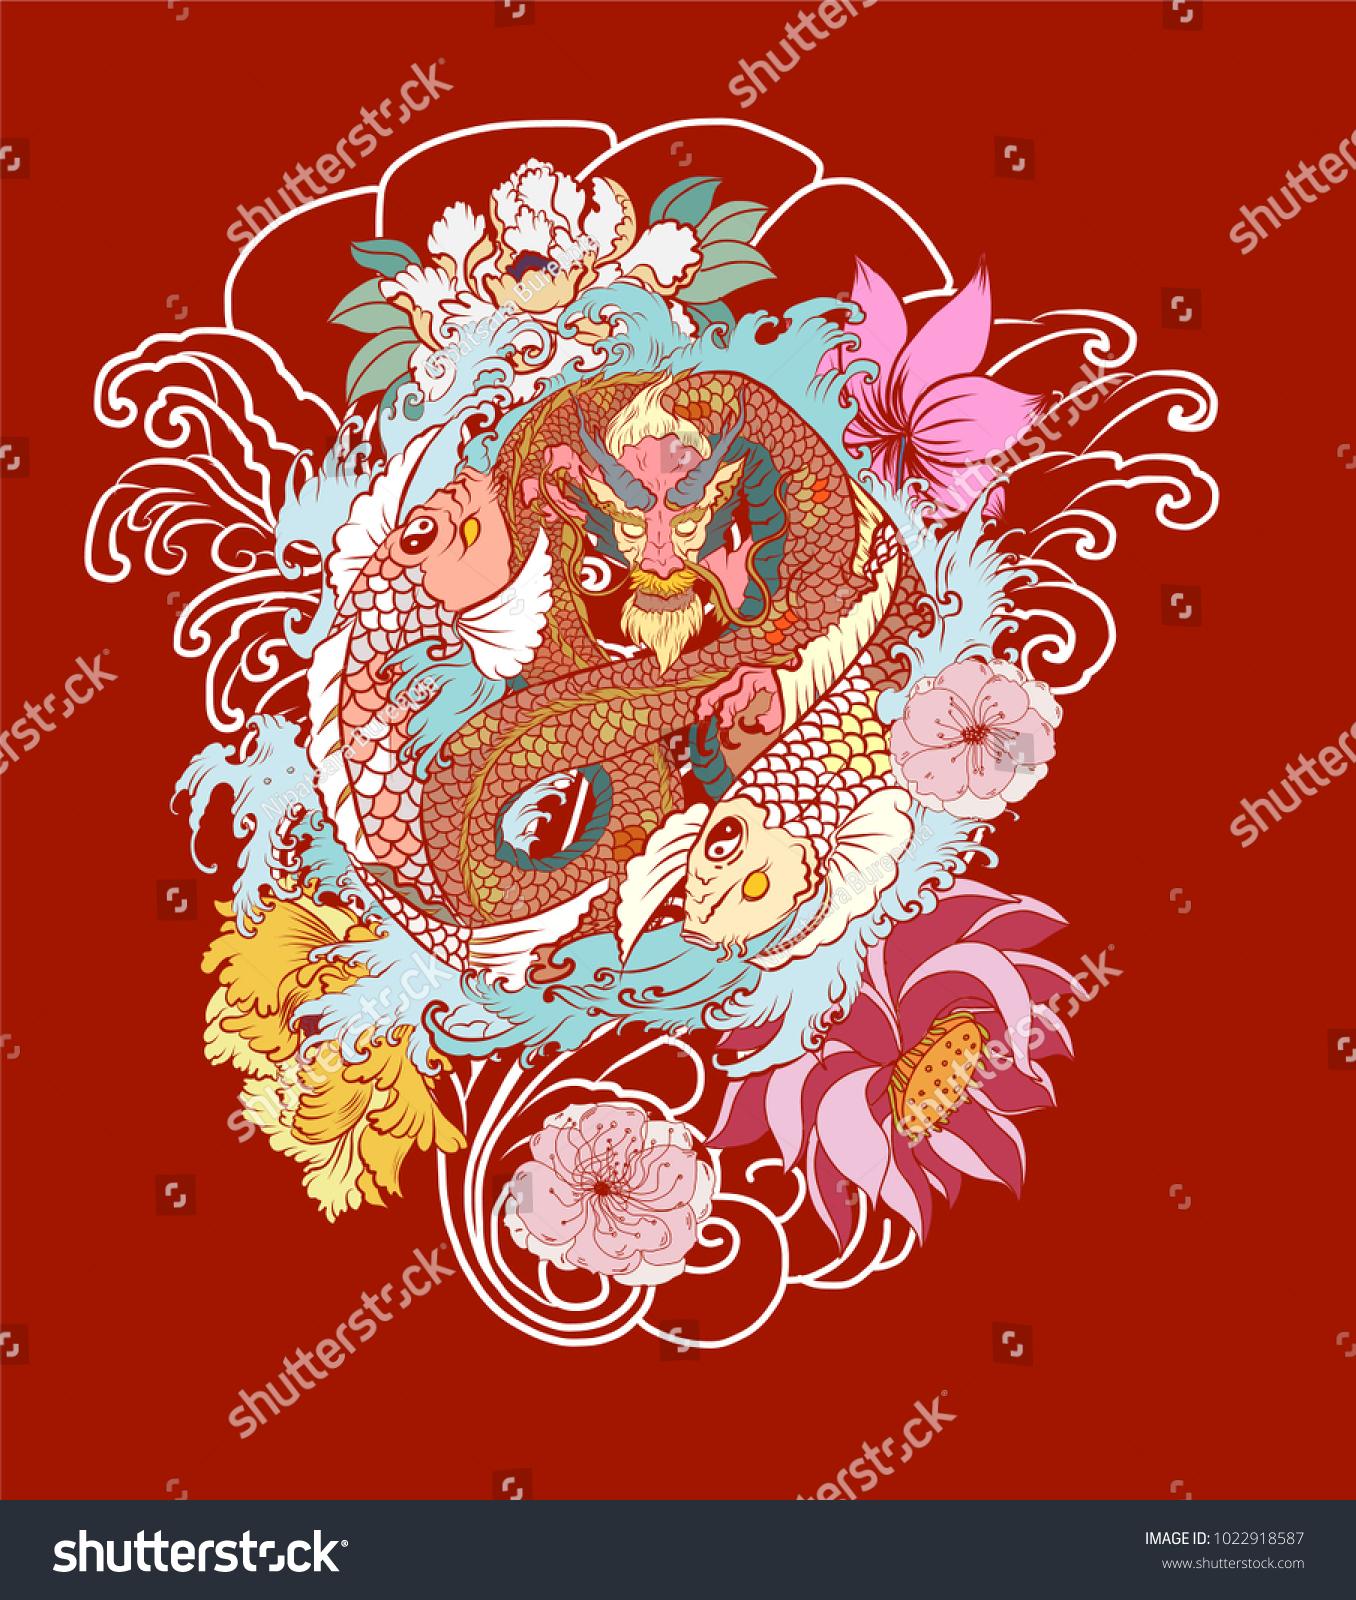 Dragon Two Koi Carp Yinyang Symbolhand Stock Photo (Photo, Vector ...